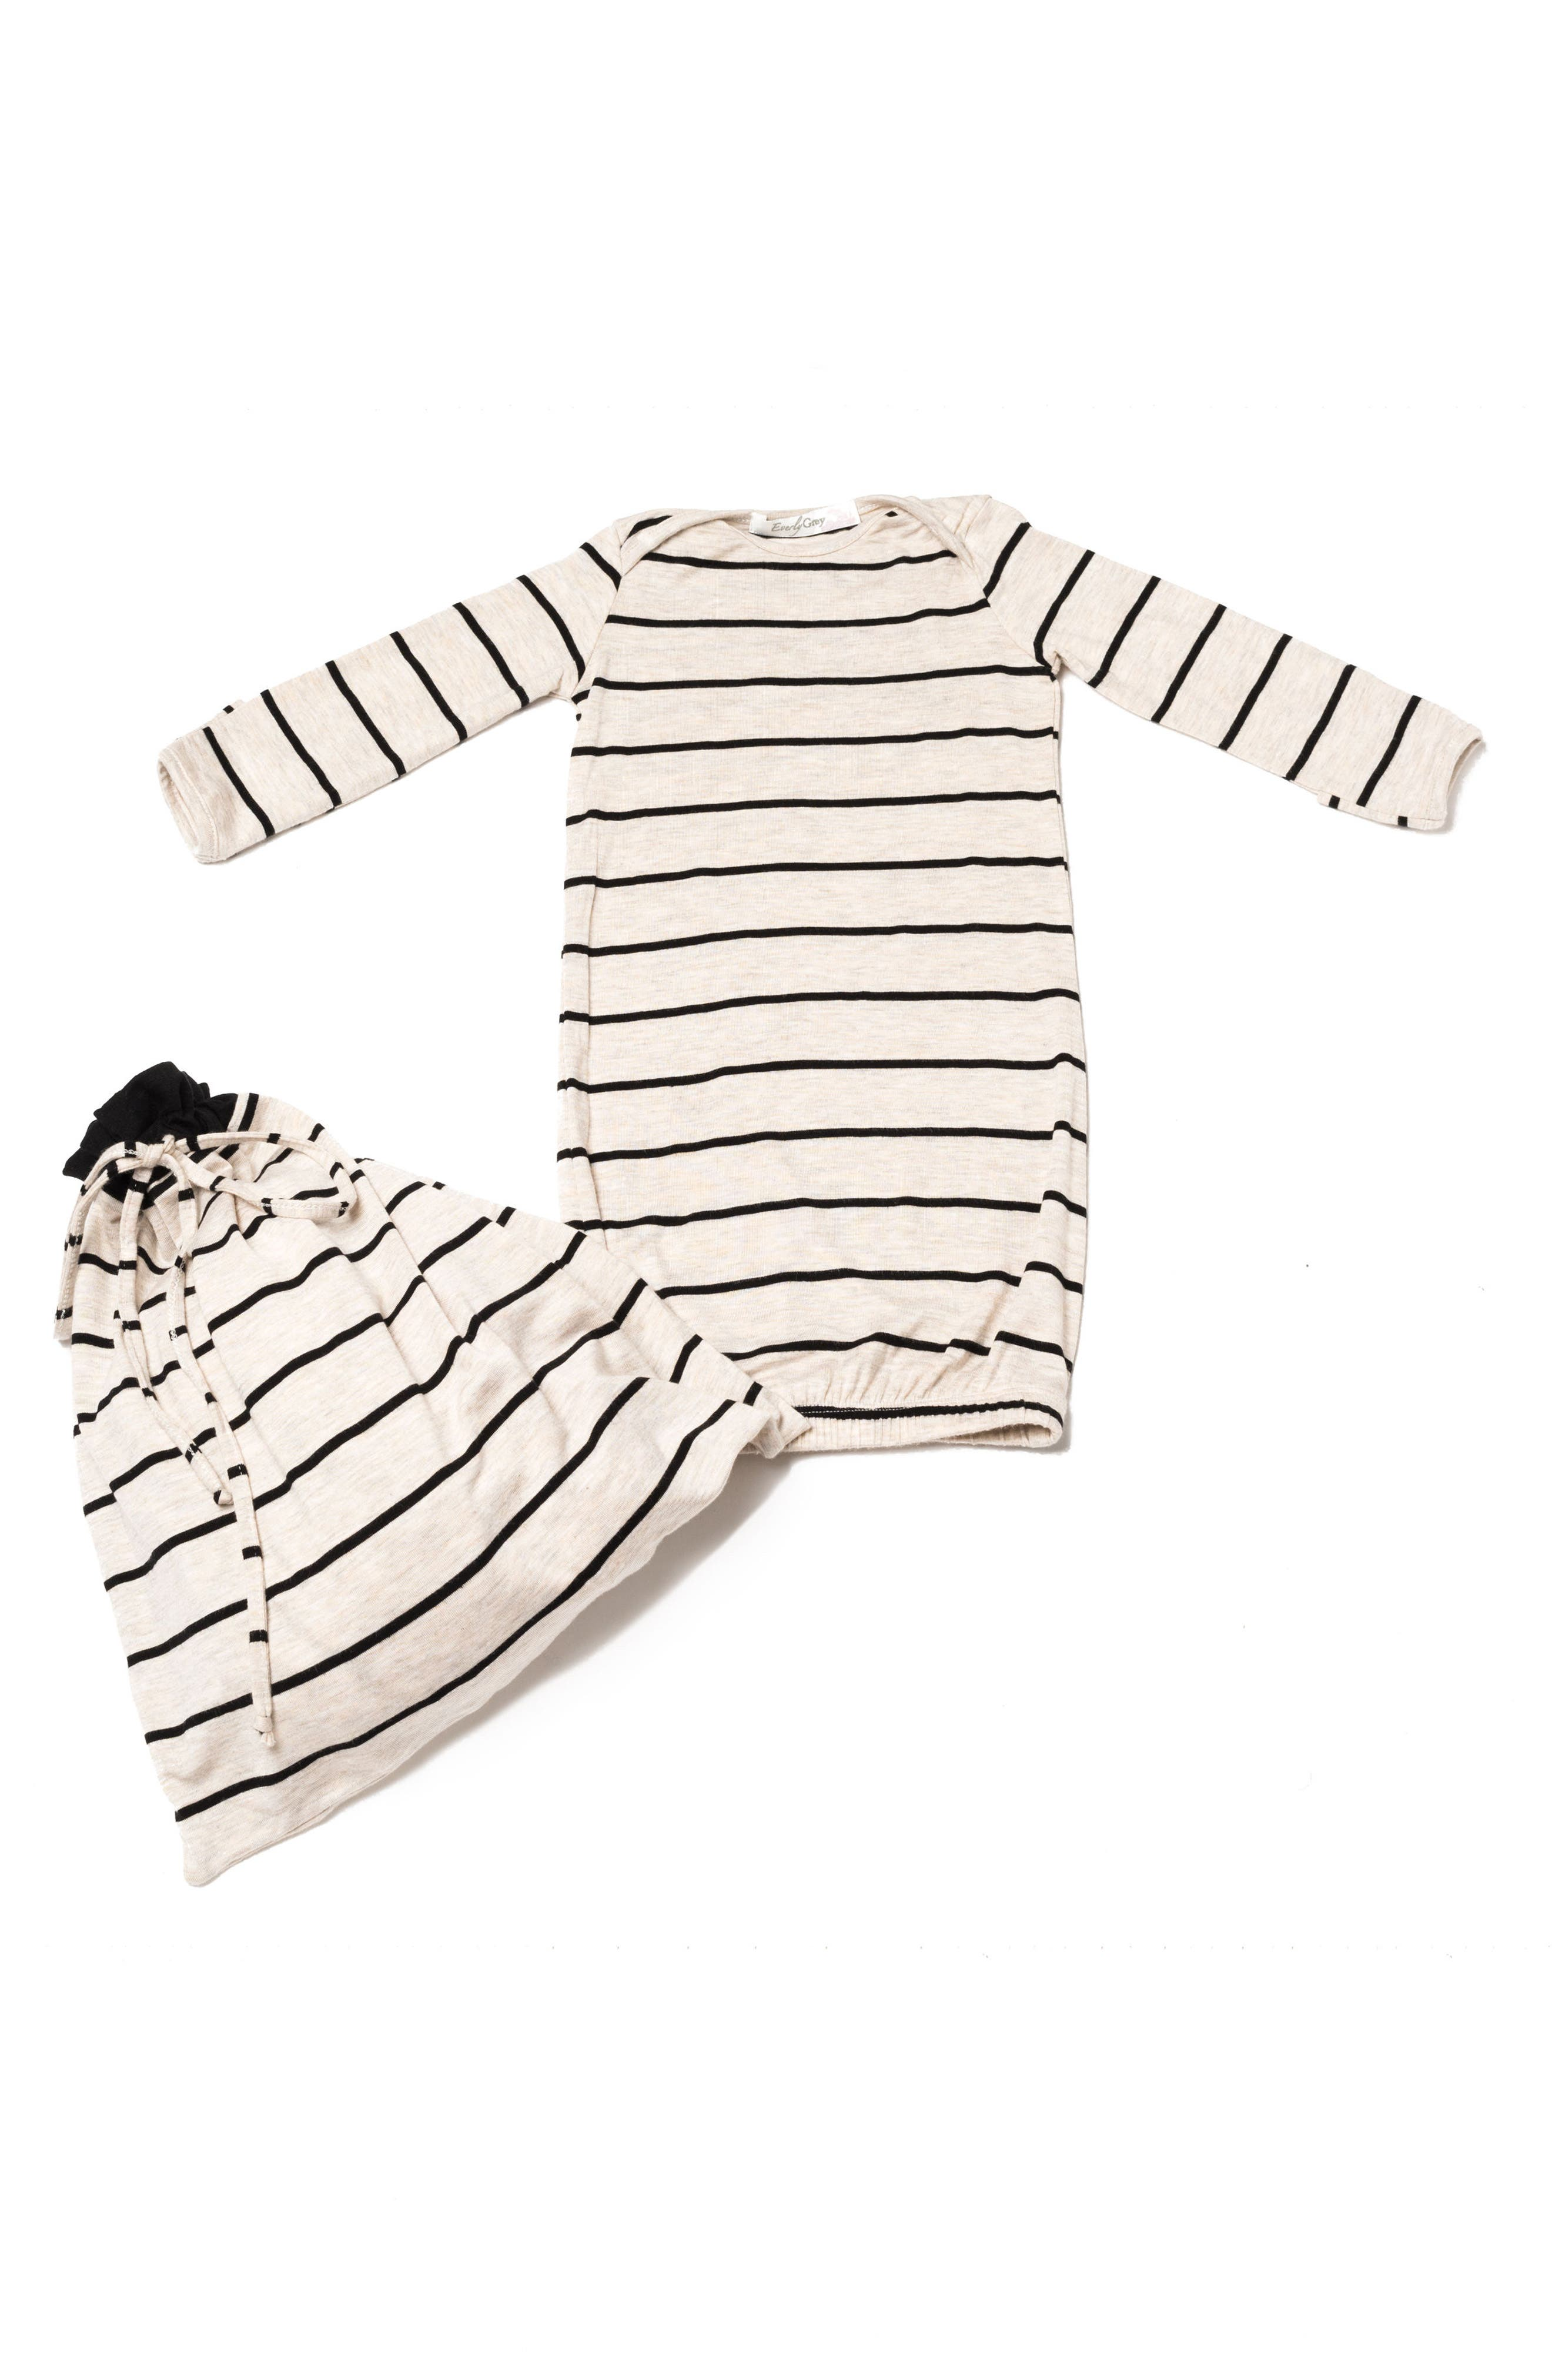 Roxanne - During & After 5-Piece Maternity Sleepwear Set,                             Alternate thumbnail 5, color,                             SAND STRIPE